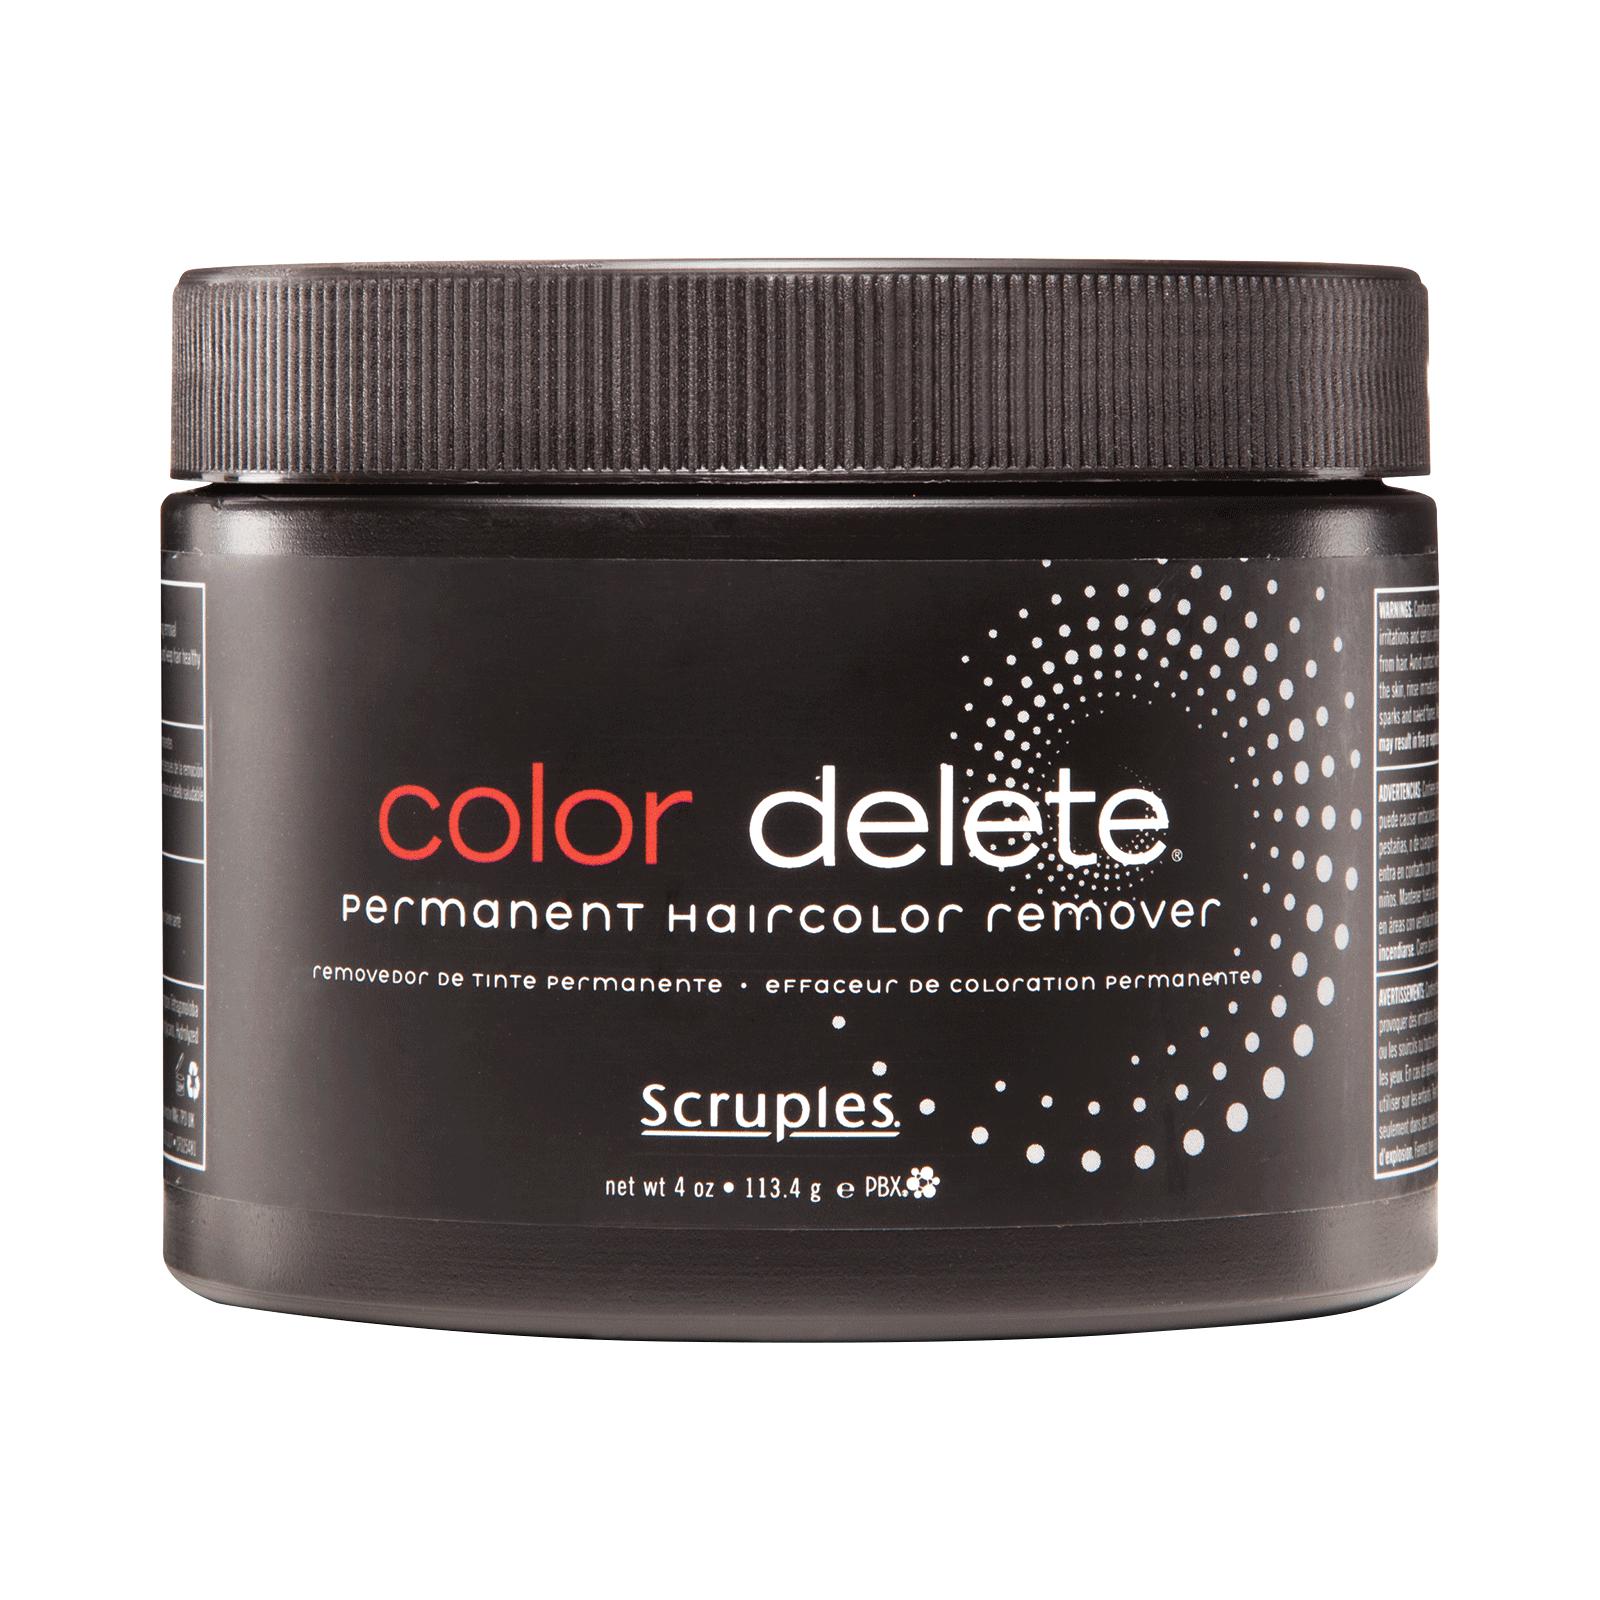 Color Delete Hair Color Remover Scruples Cosmoprof